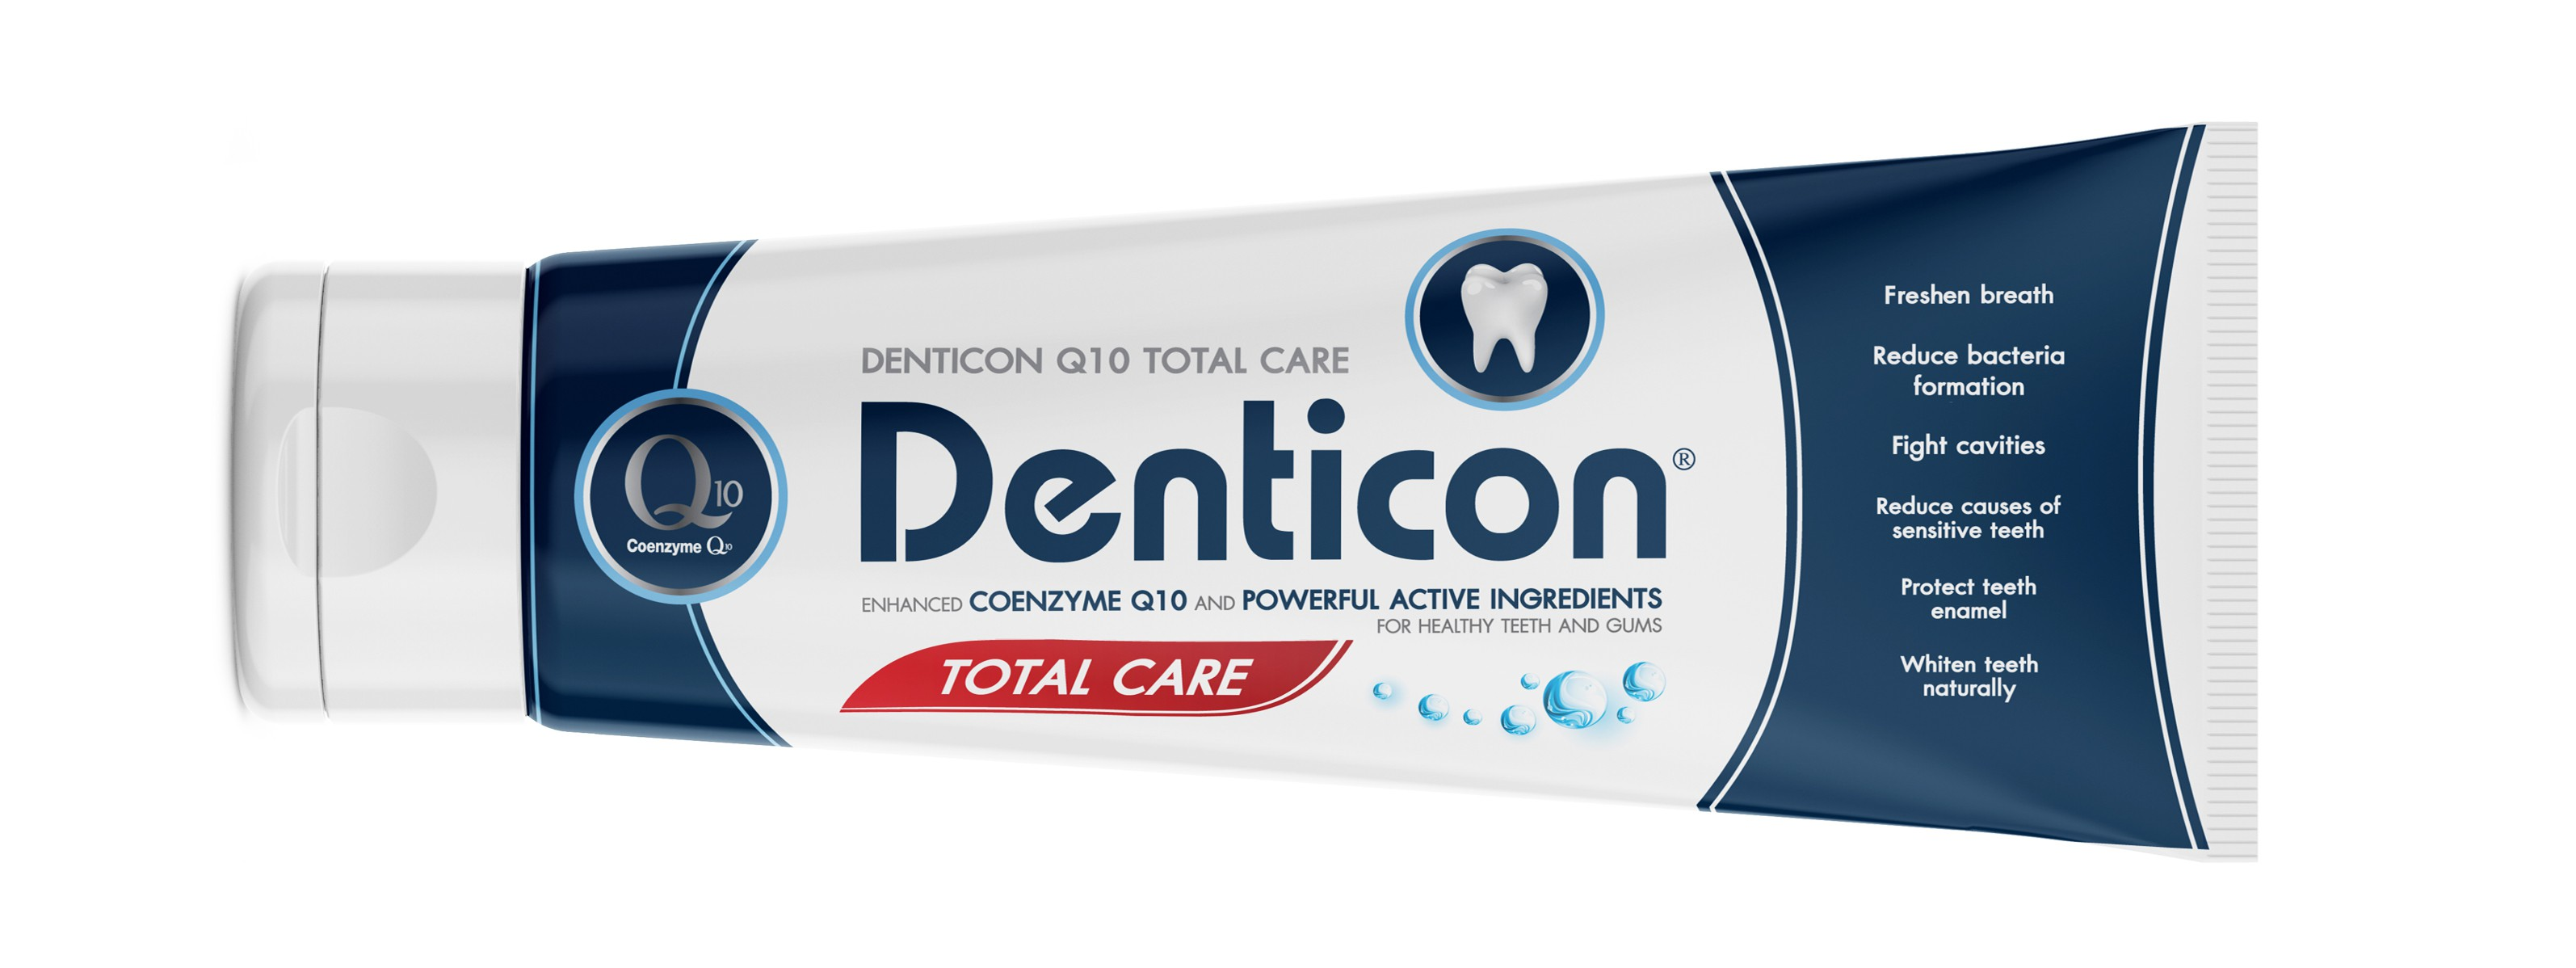 minor change toothpaste package design